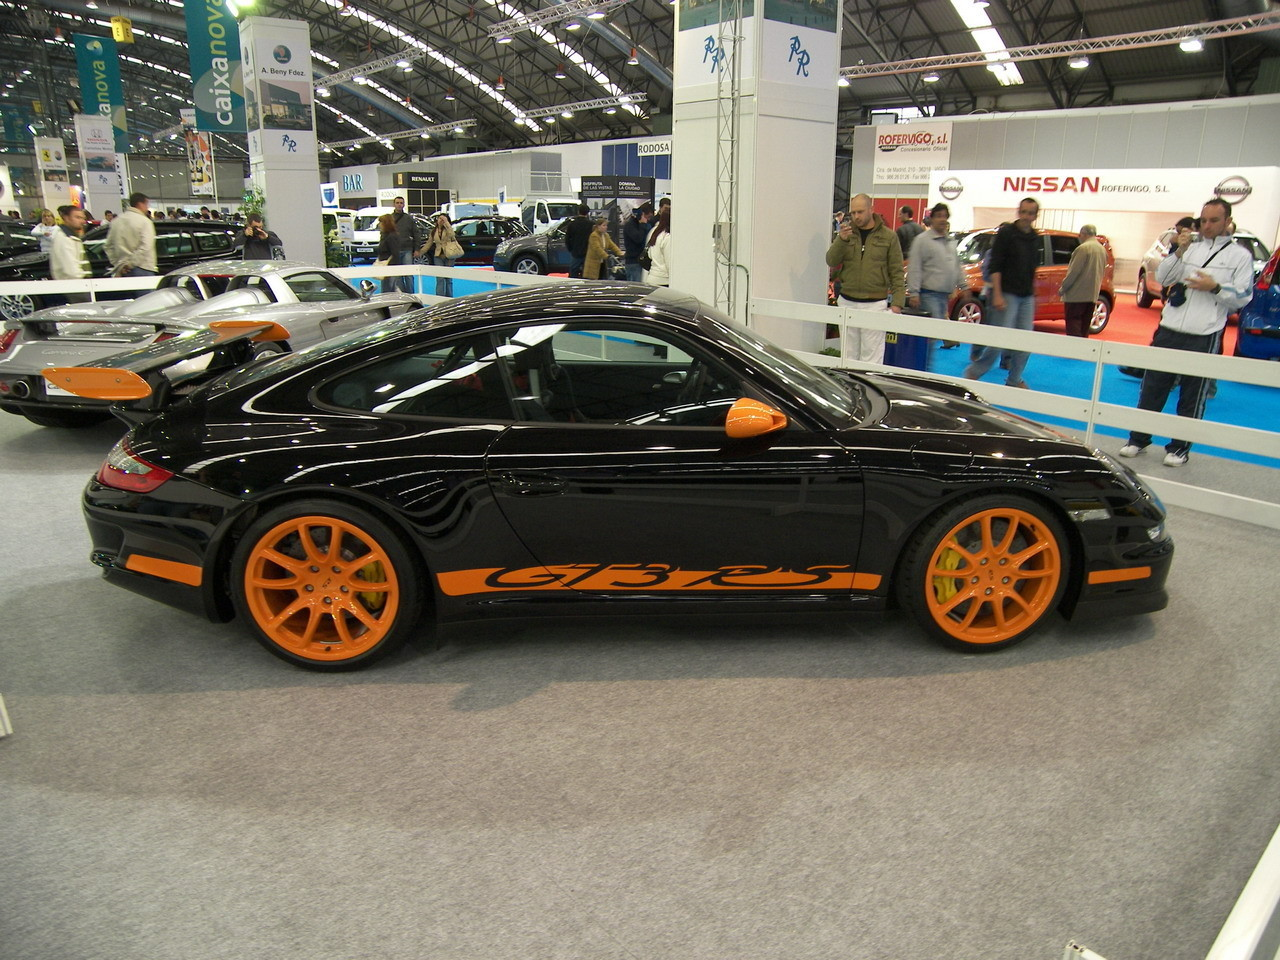 Porsche 911 Gt3 Vigo 3 Bild - 368.48 KB - Honda Forum & Tuning ...